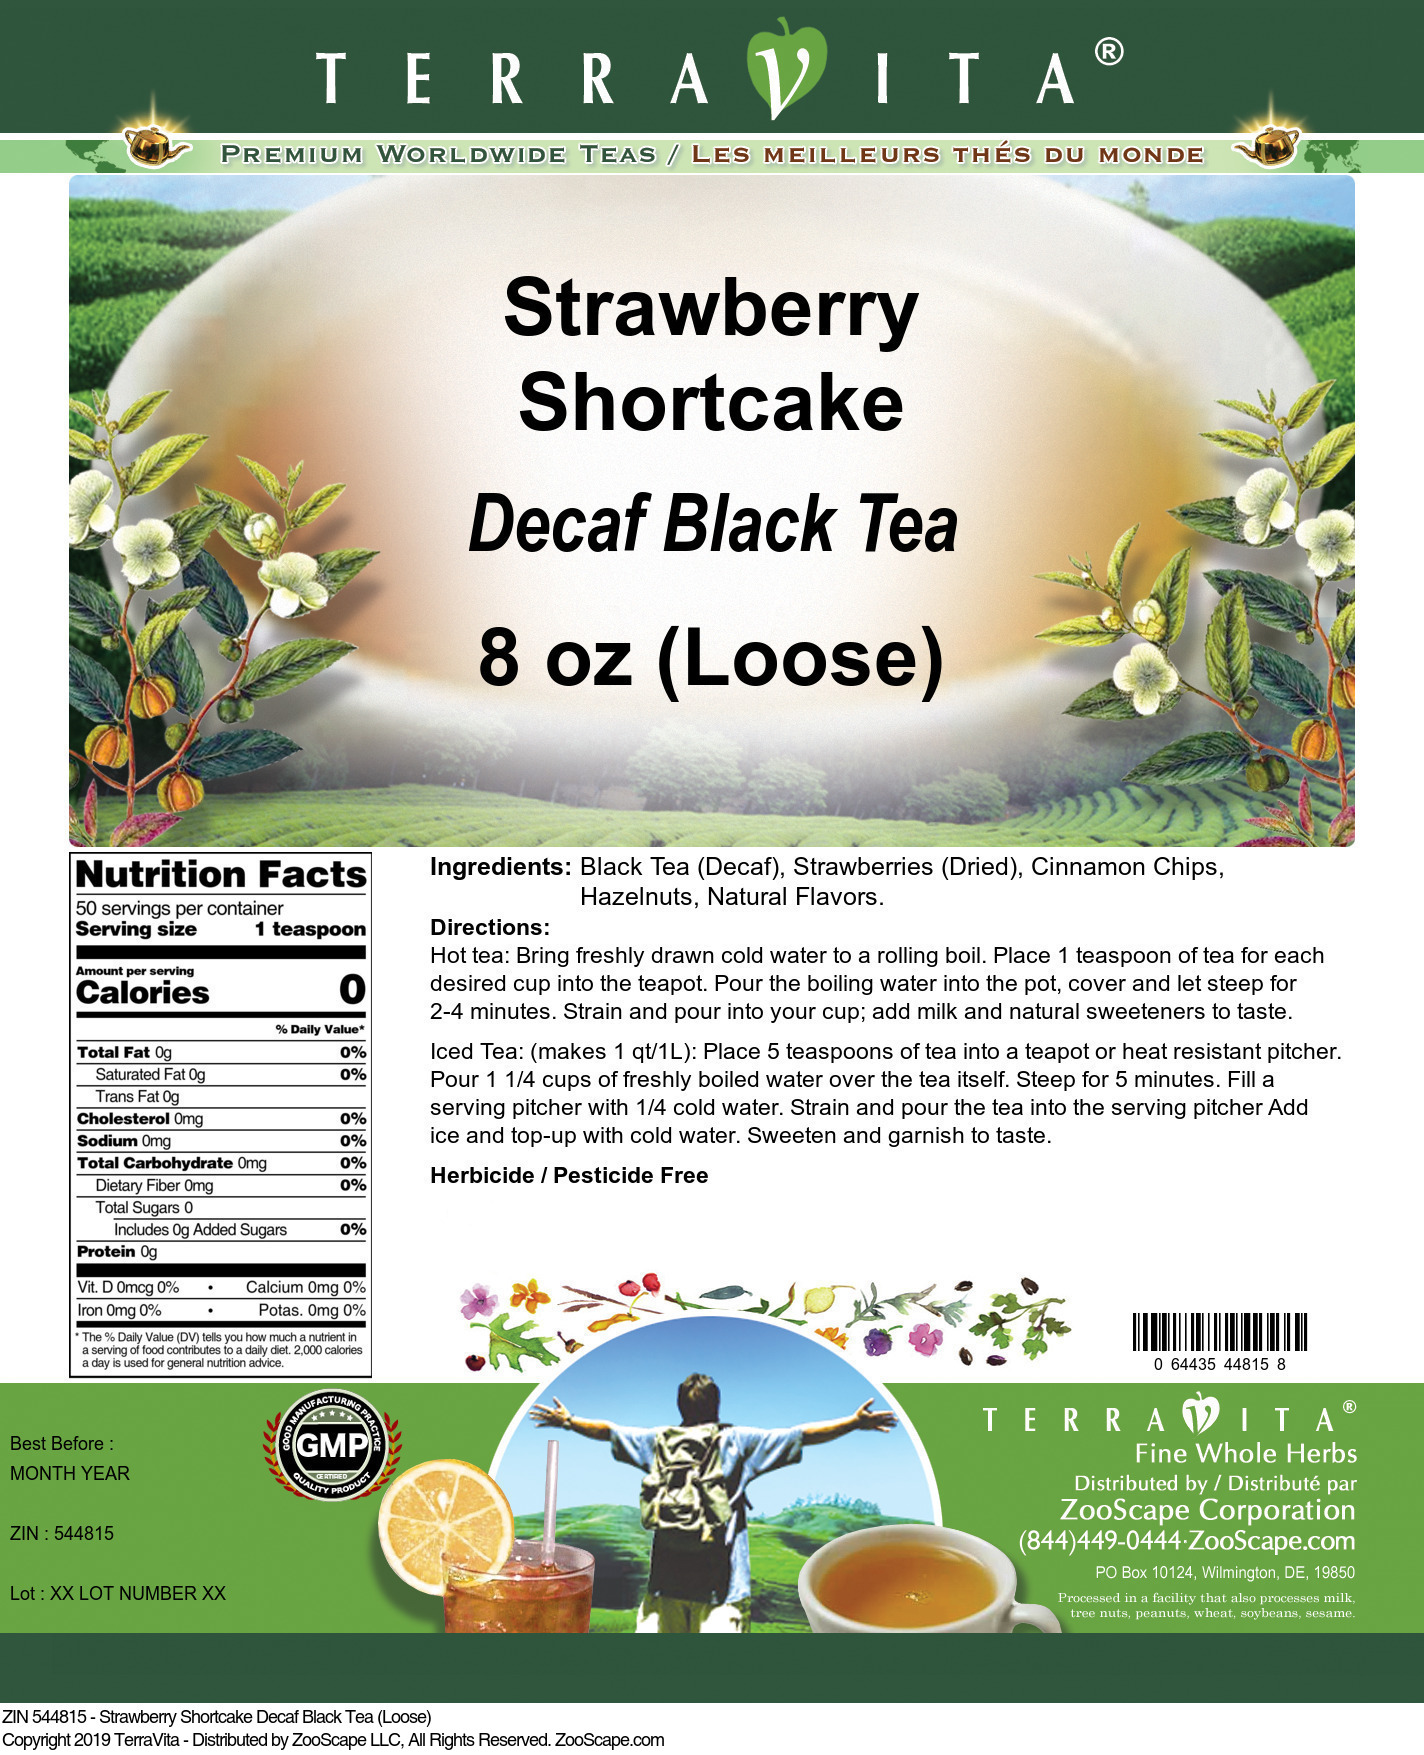 Strawberry Shortcake Decaf Black Tea